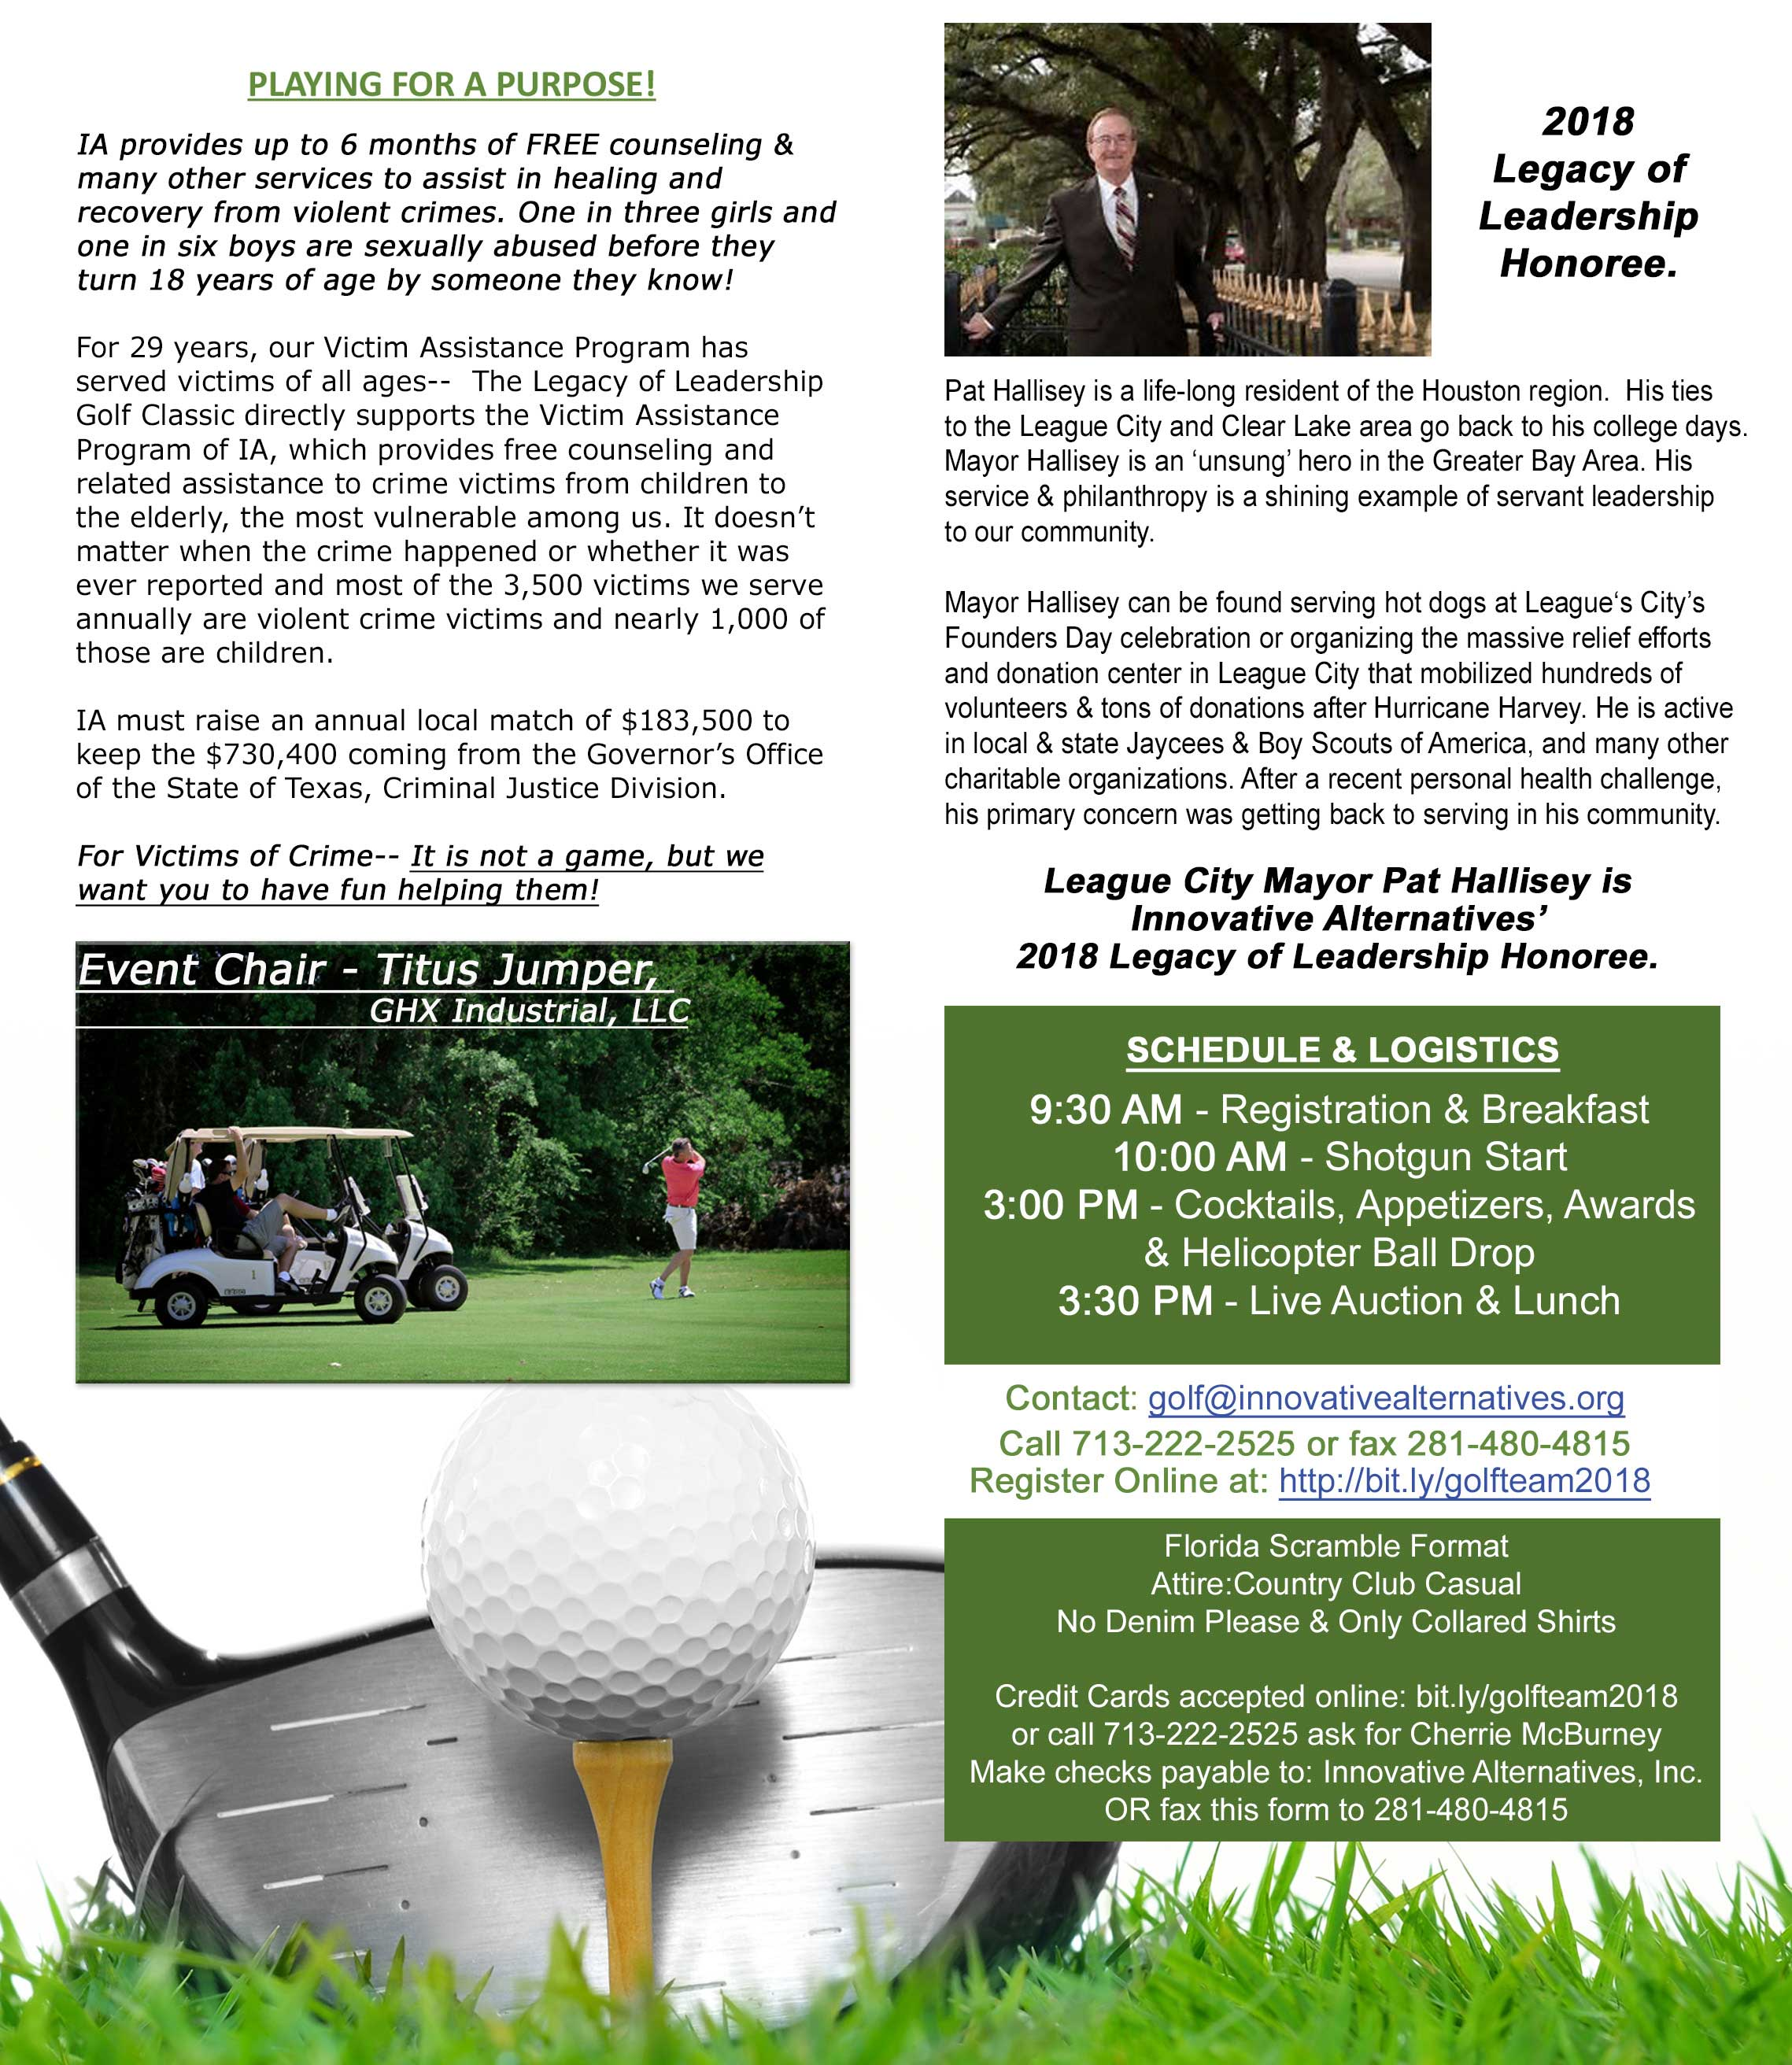 Legacy of Leadership Golf Classic Info